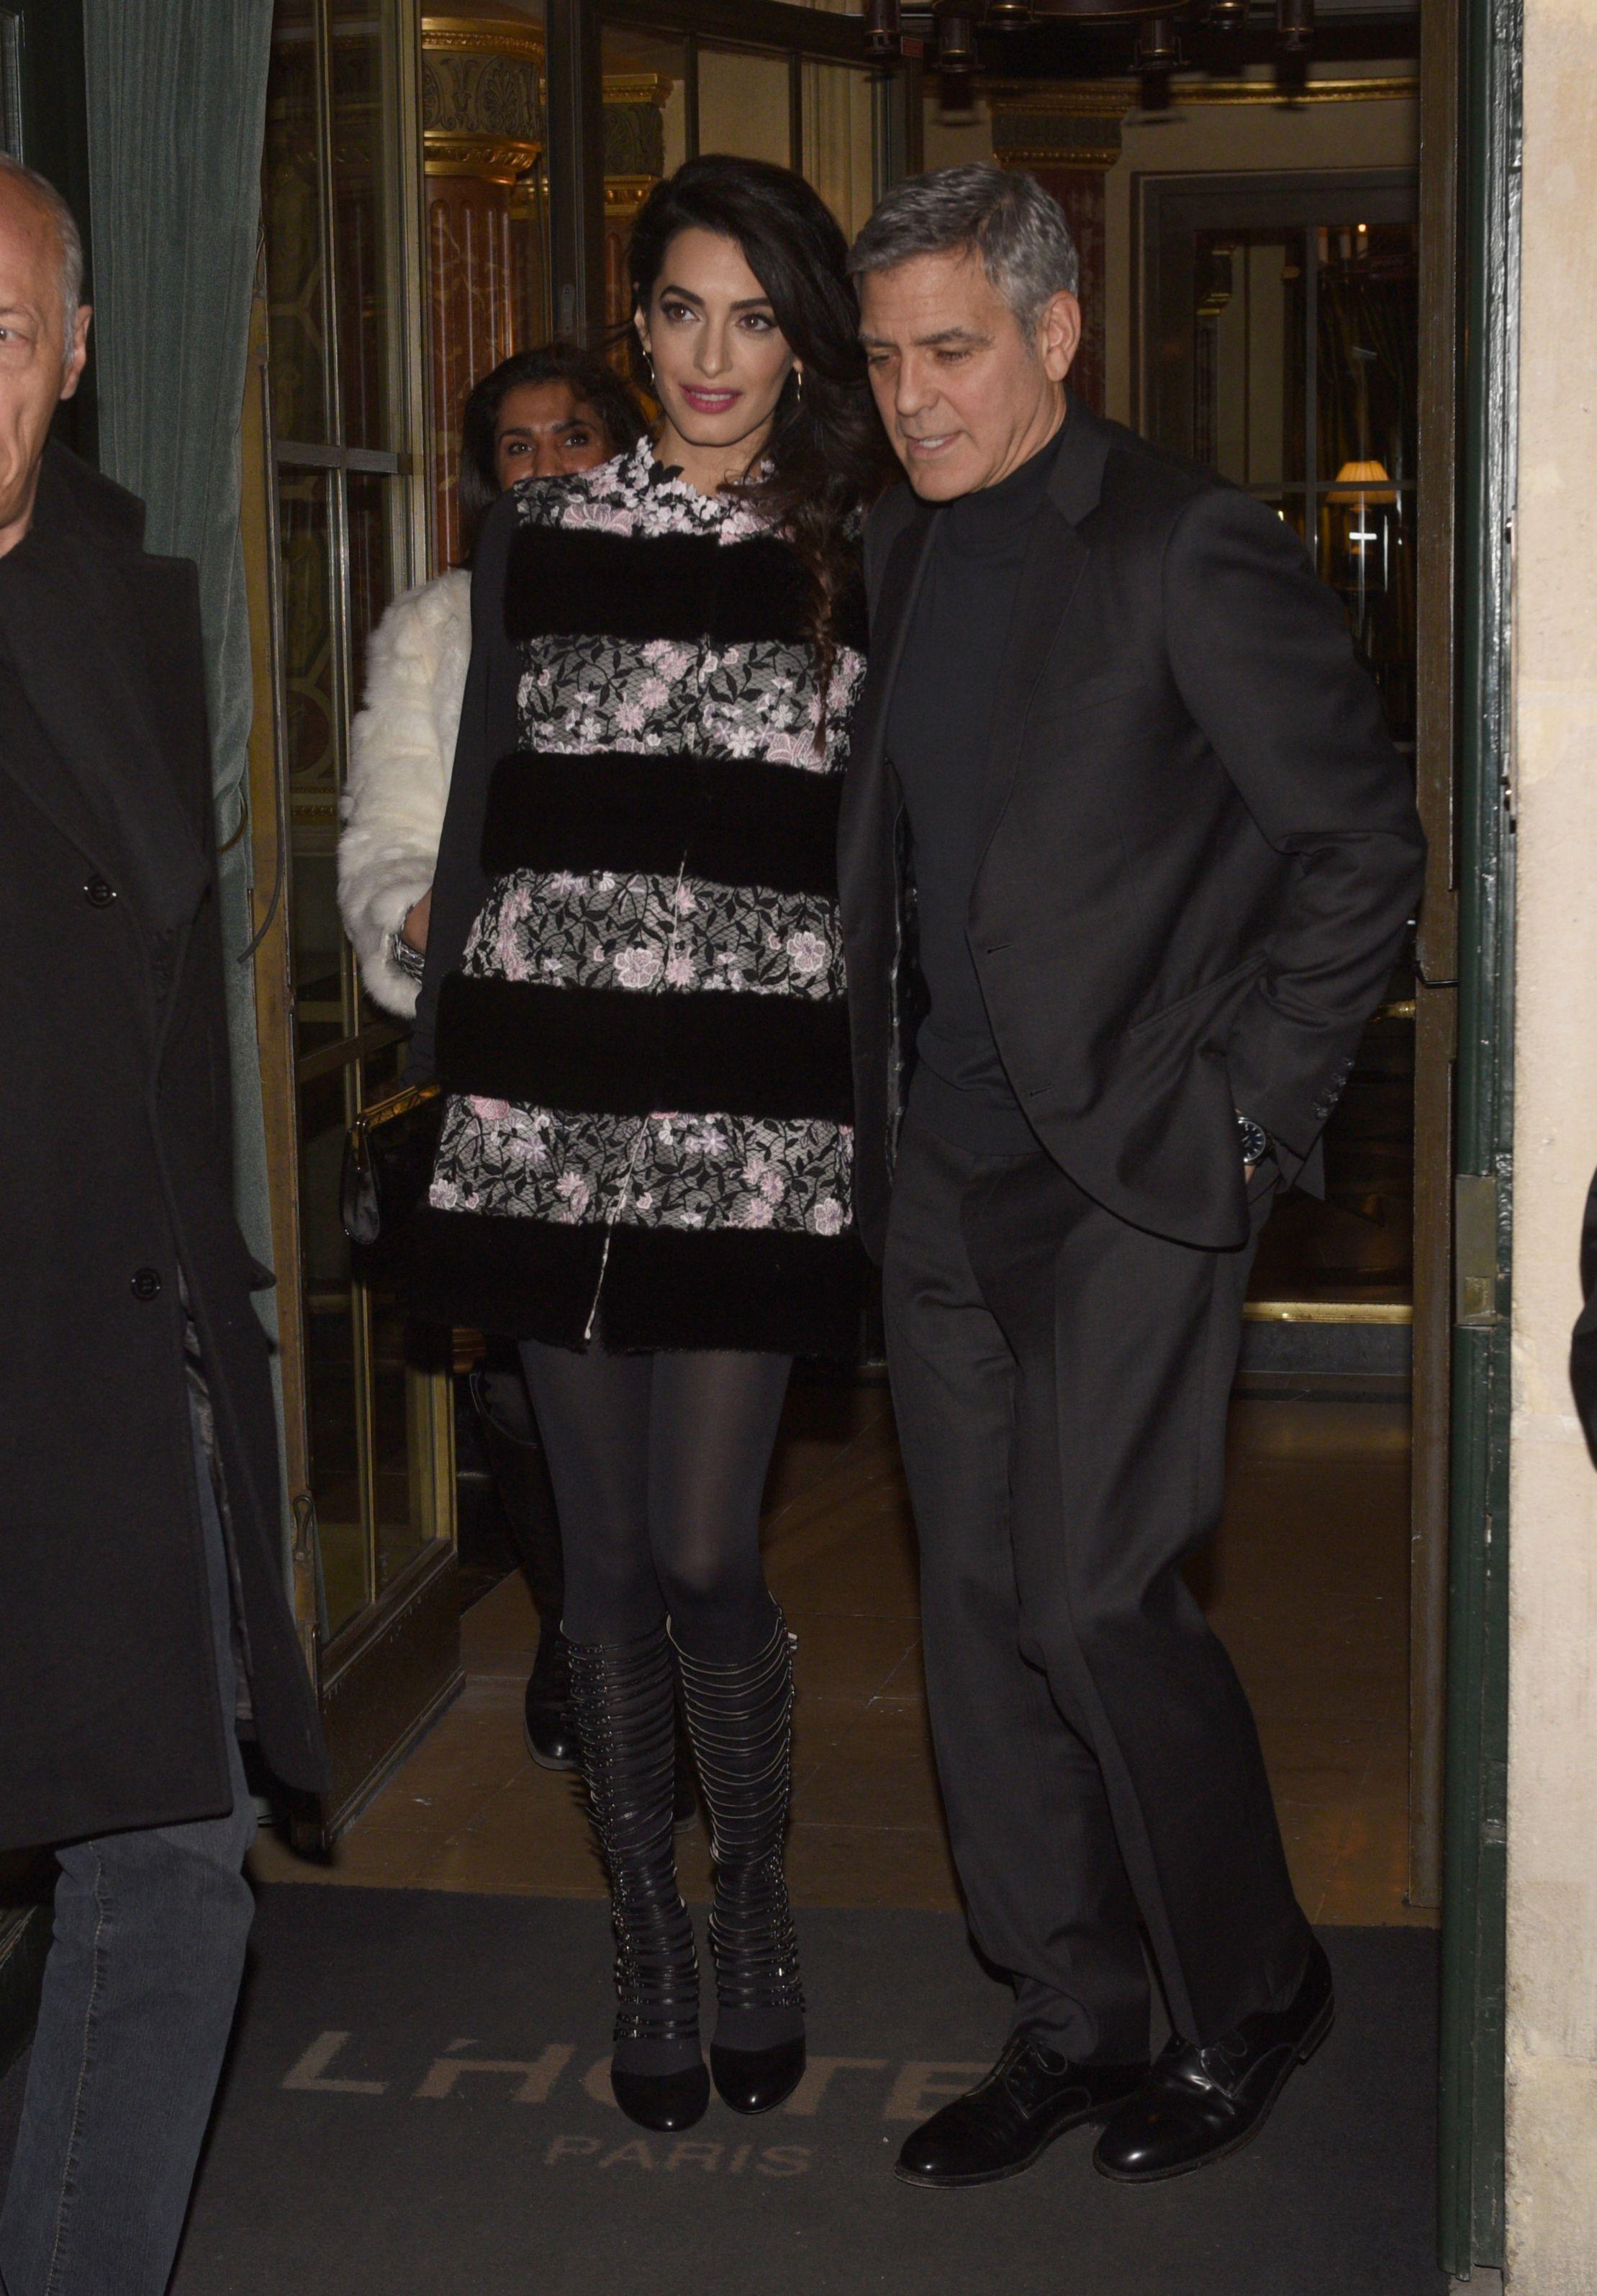 258d8d4c122 Amal Clooney Best Style Moments - Amal Clooney Fashion Photos